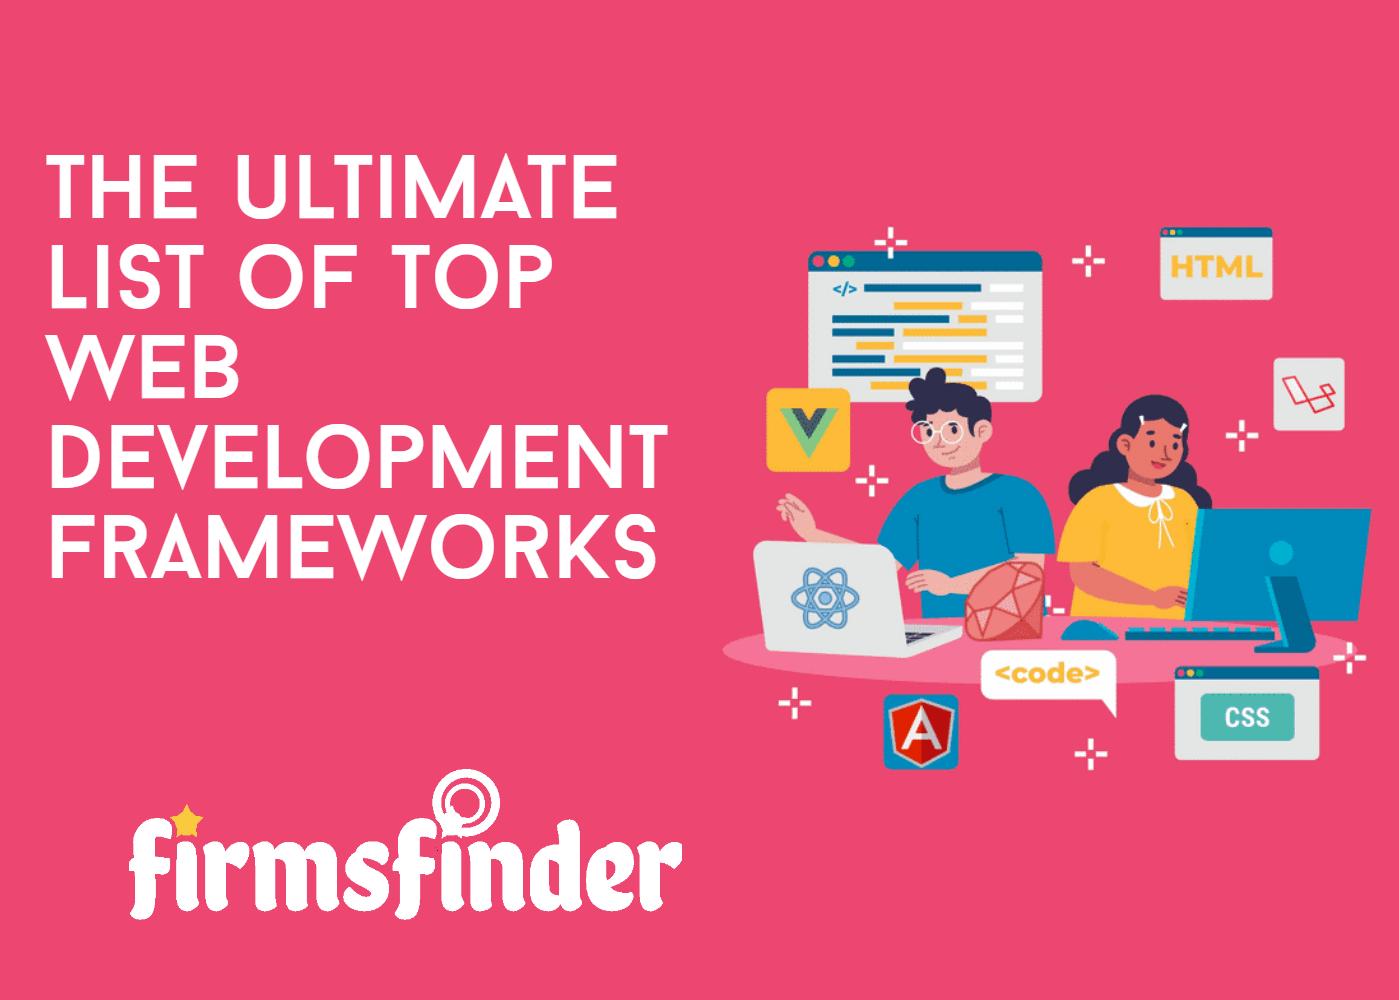 The ultimate list of top web development frameworks